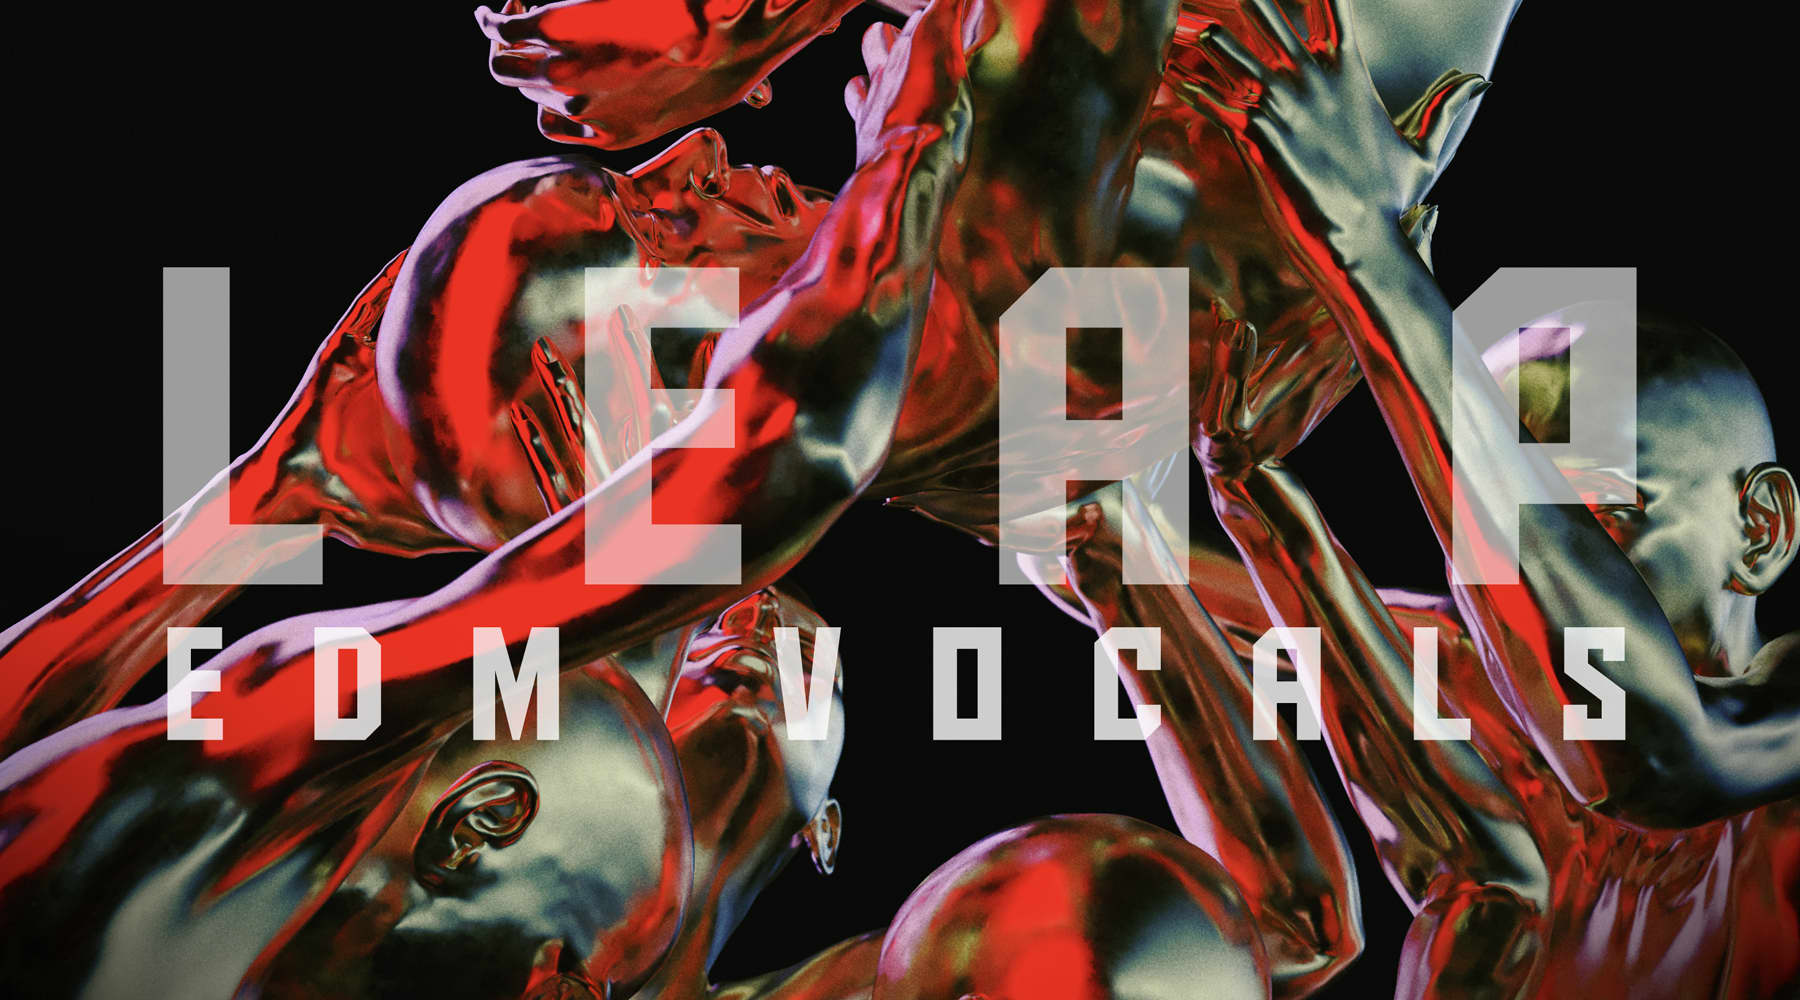 Leap - EDM Vocals